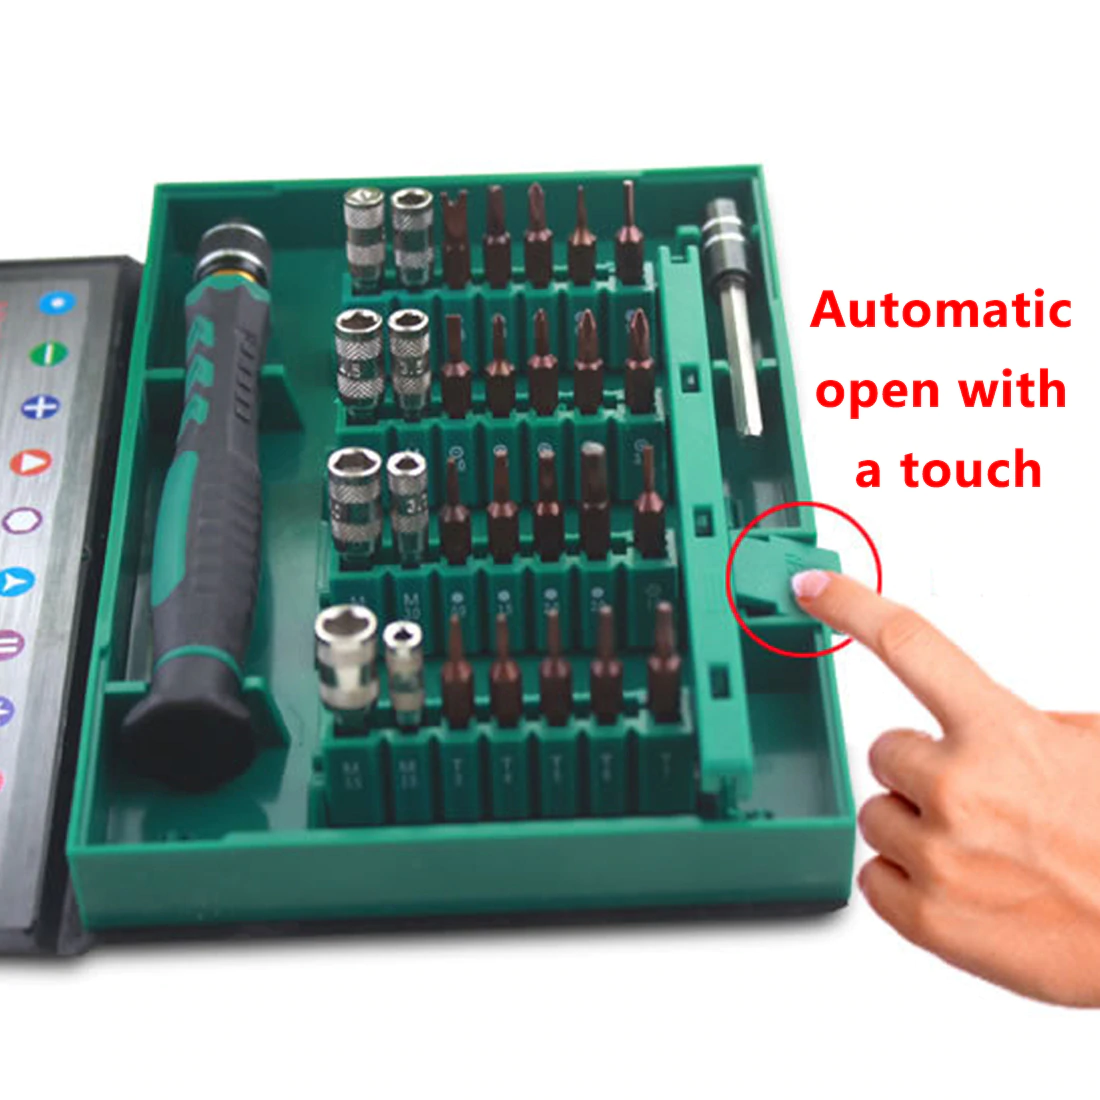 38-In-1-Magnetic-Screwdriver-Set 38 In 1 Magnetic Screwdriver Kit